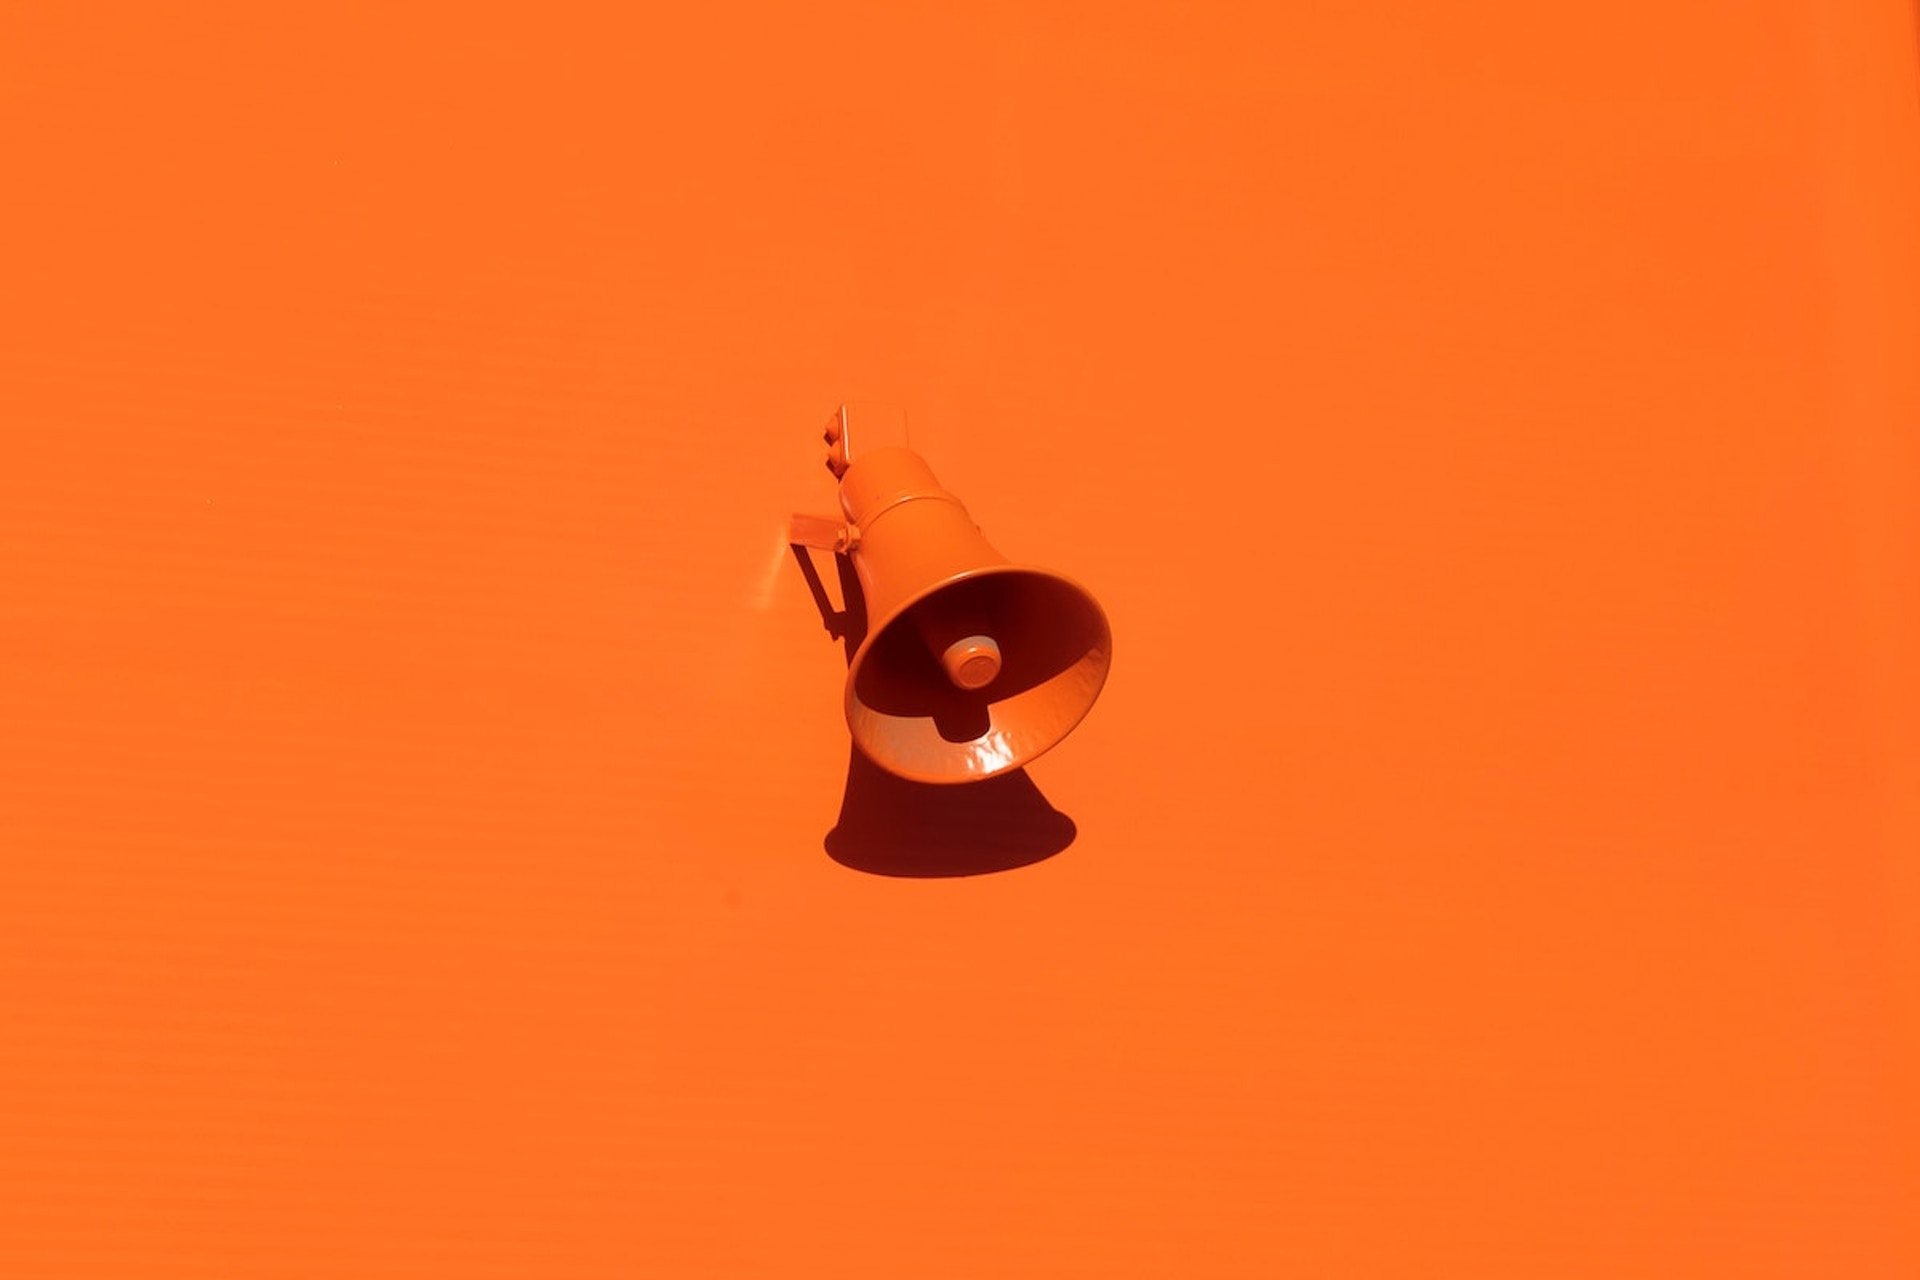 An orange megaphone on an orange surface